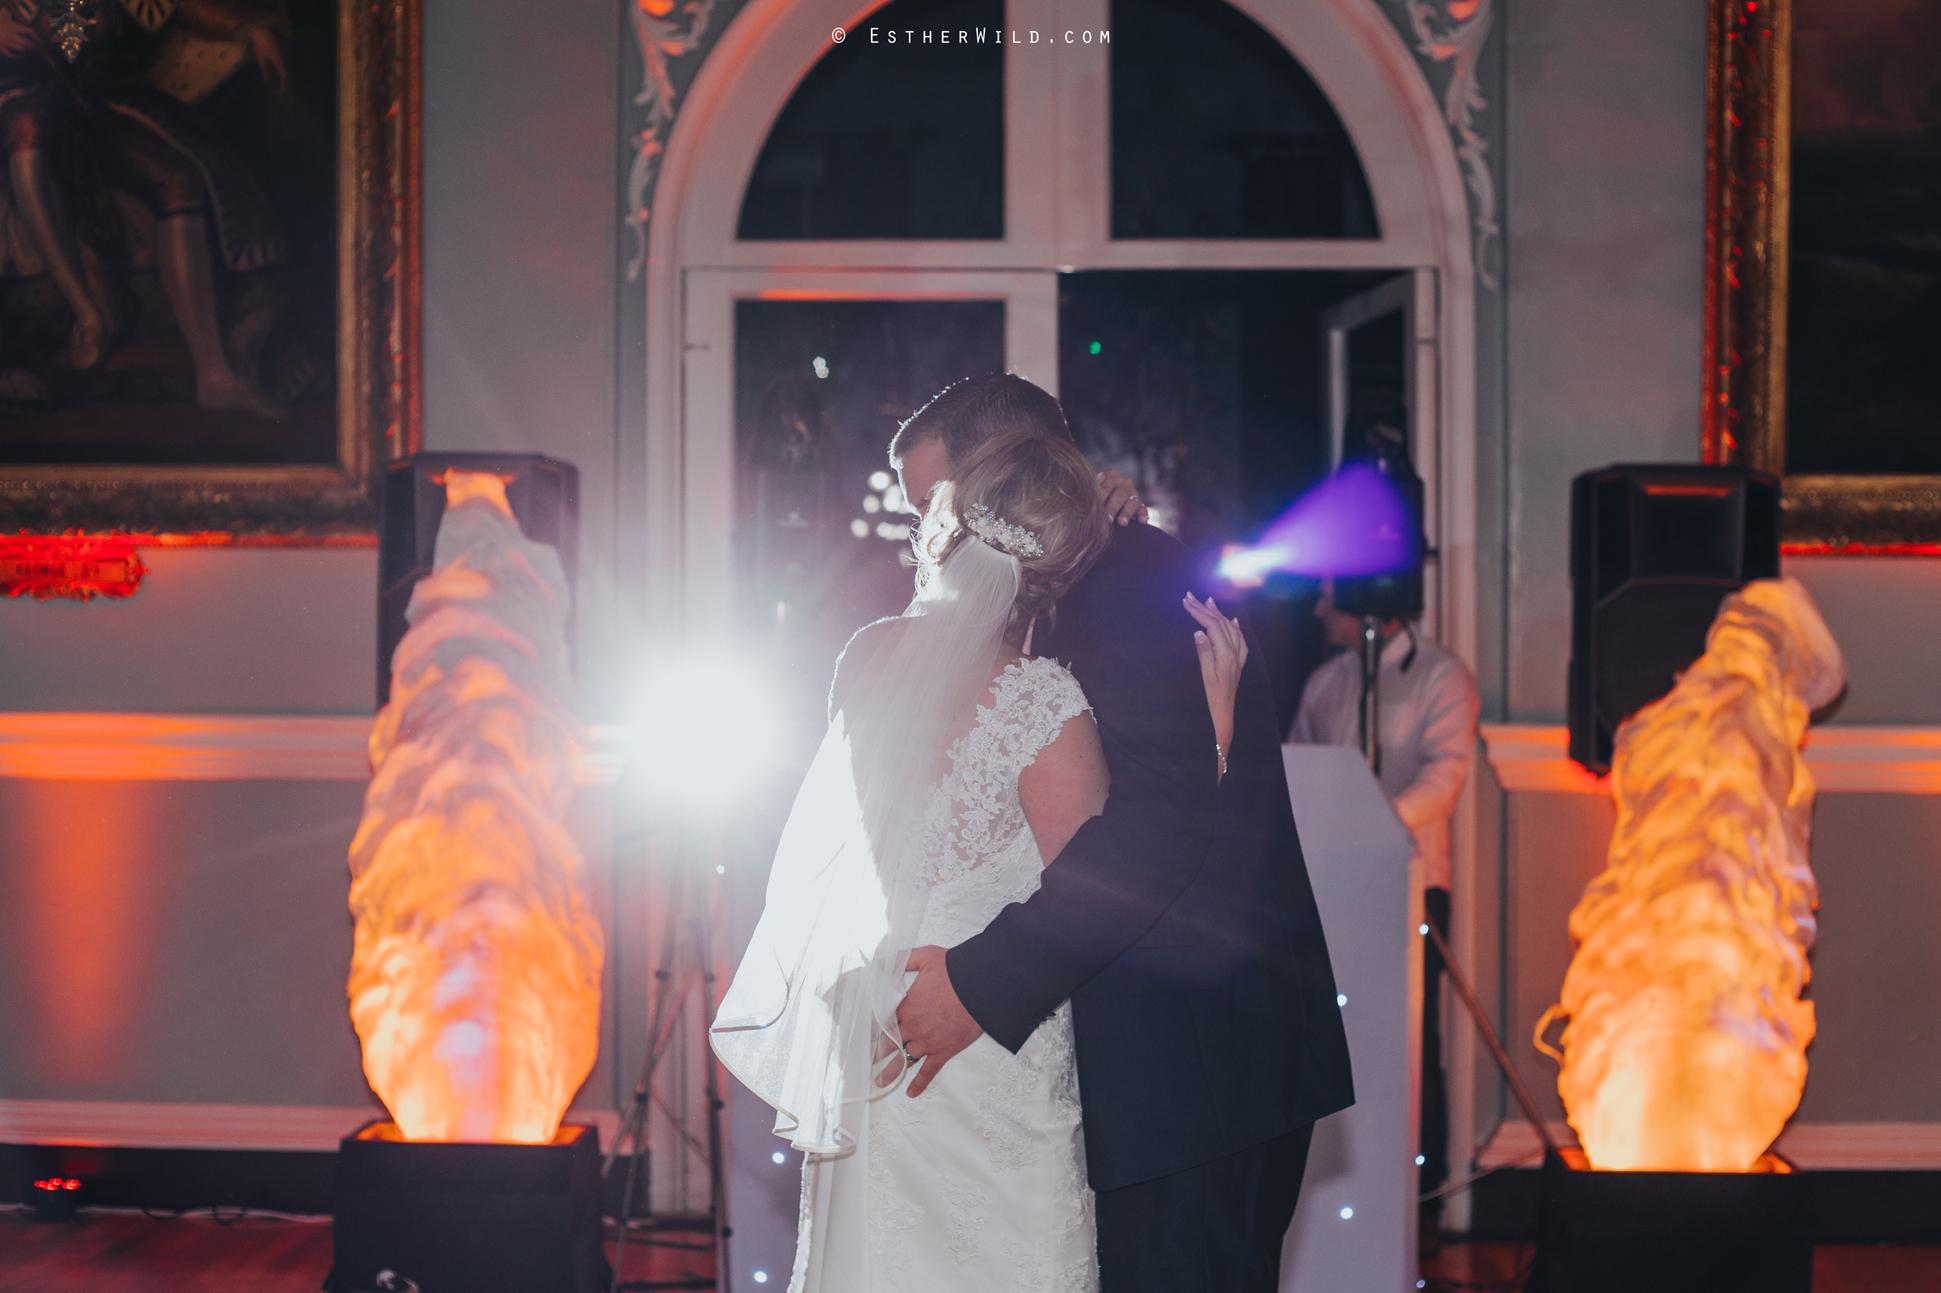 Wedding_Kings_Lynn_Town_Hall_Norfolk_Photographer_Esther_Wild_IMG_1824.jpg